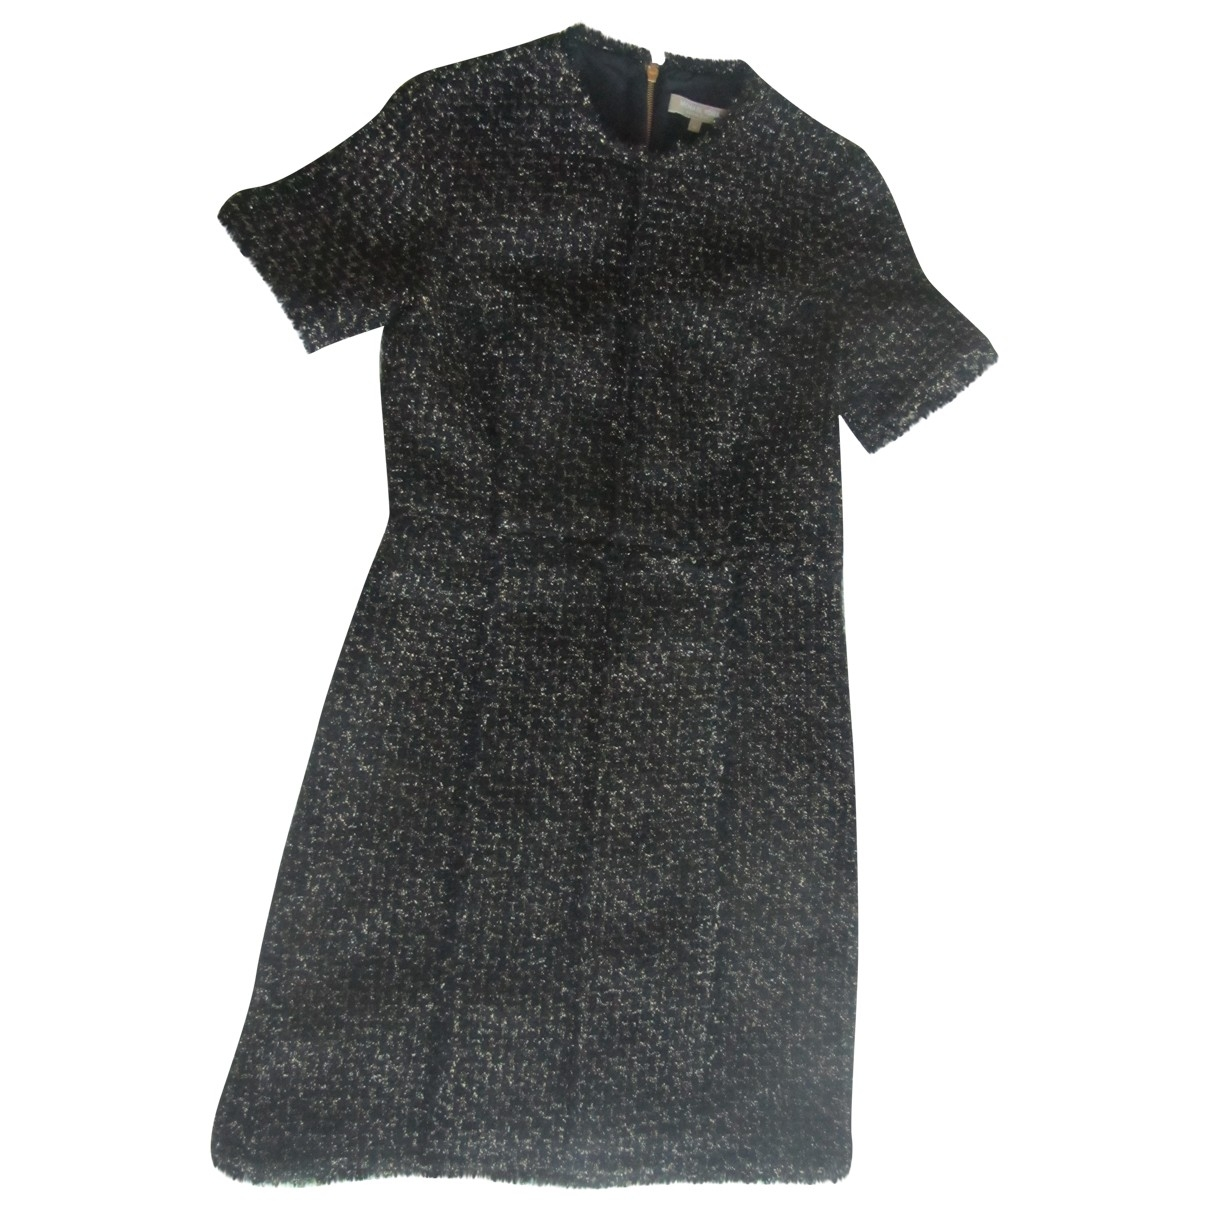 Michael Kors \N Multicolour Wool dress for Women 10 US